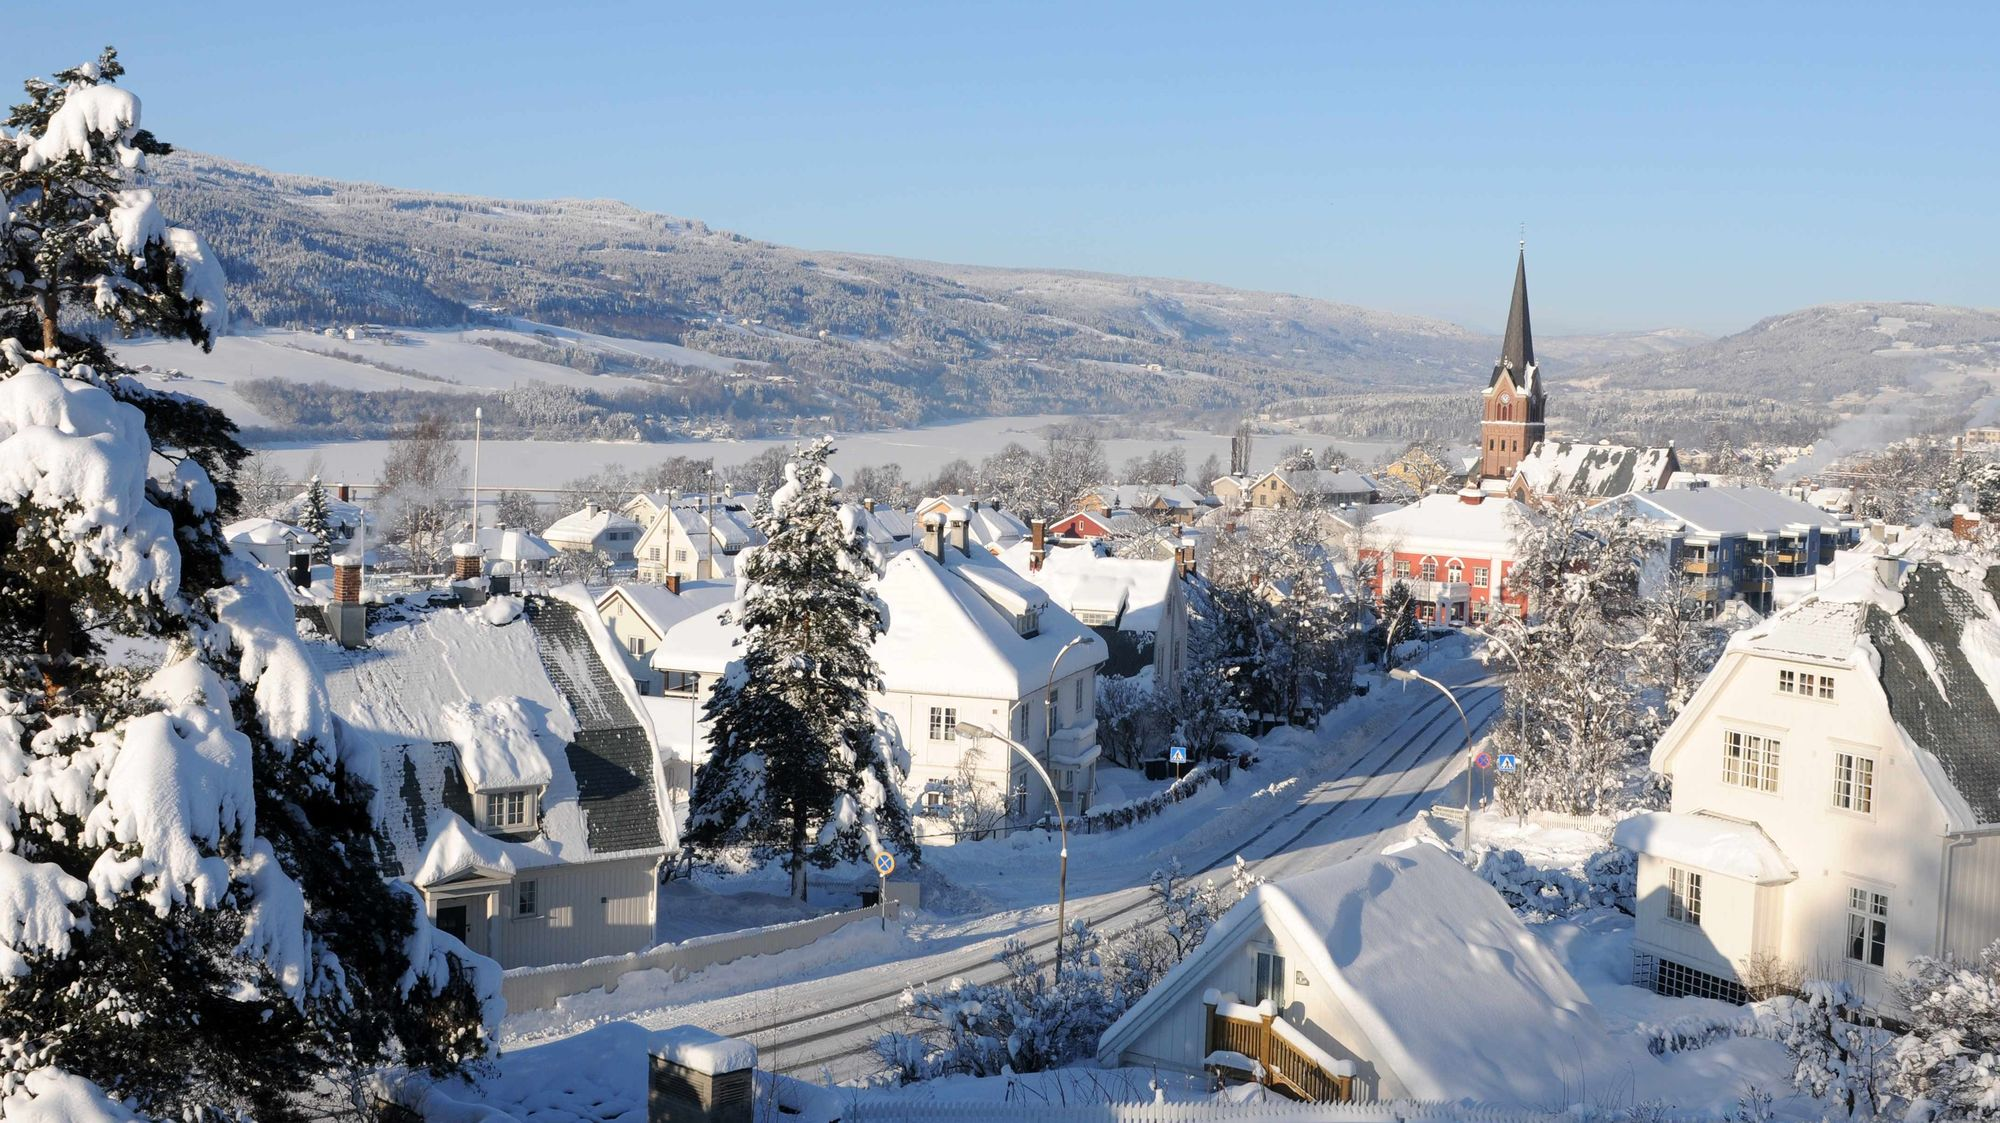 Фото: город Лиллехаммер в Норвегии